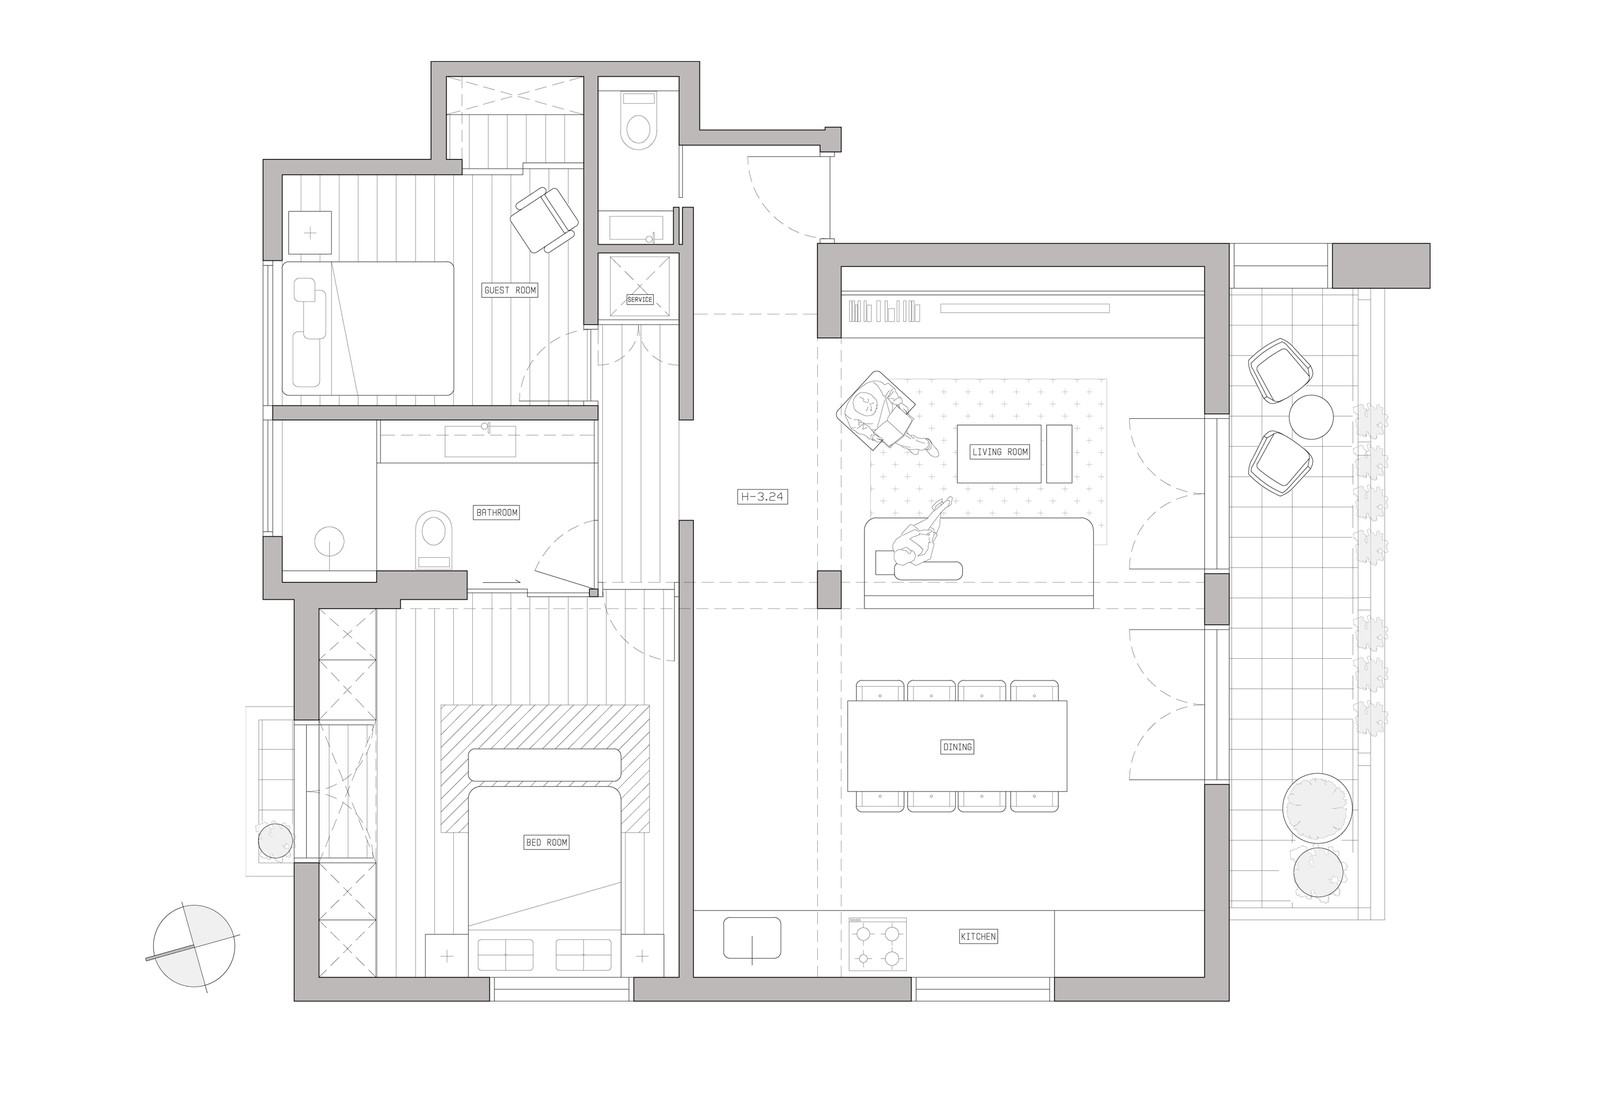 Apartment-renovation-just3ds.com-24